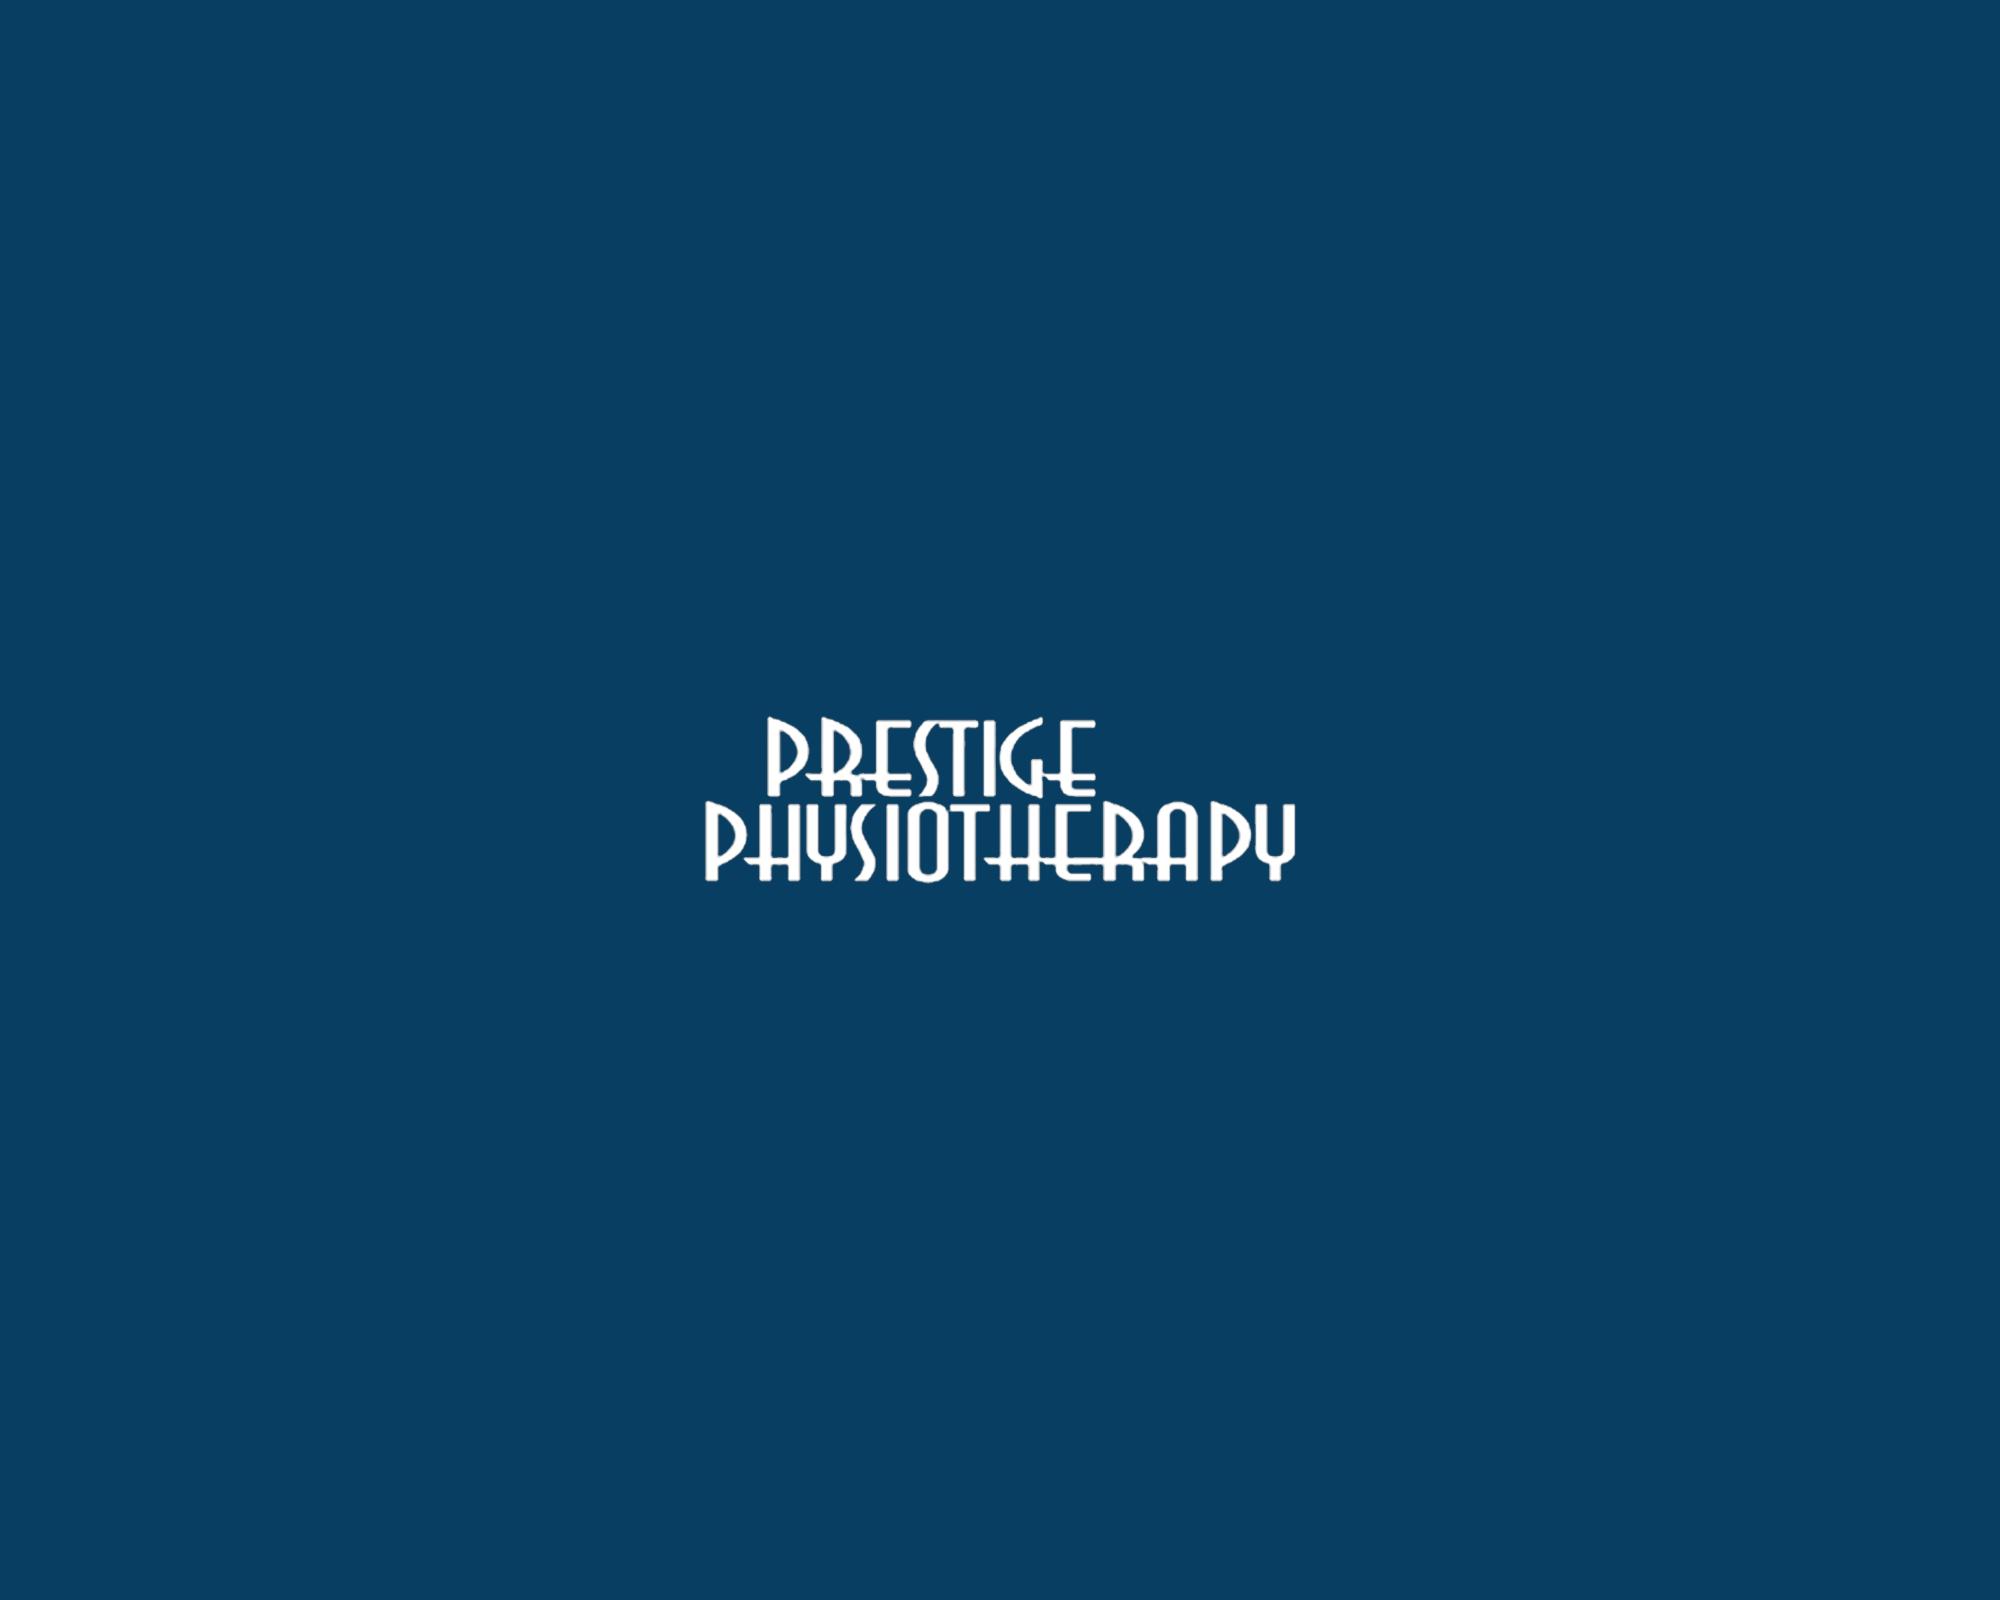 prestiege physiotherapy Logo